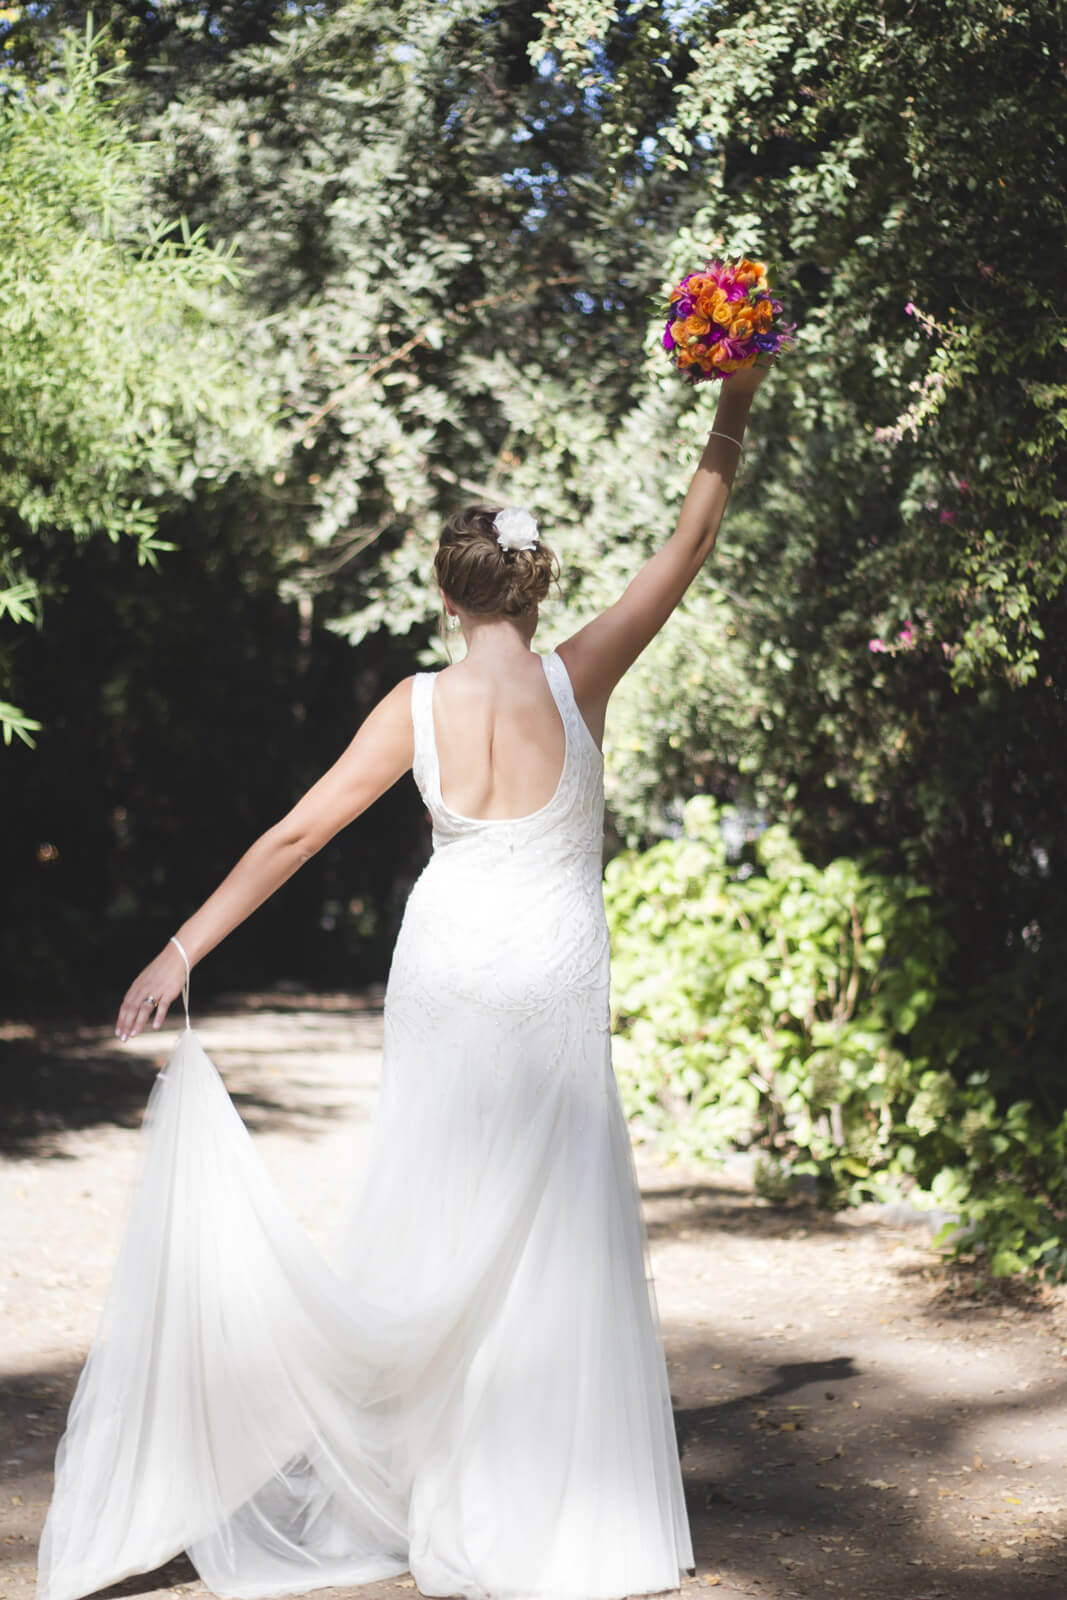 Bride! - Stef & Guille - Casa Parque Nos